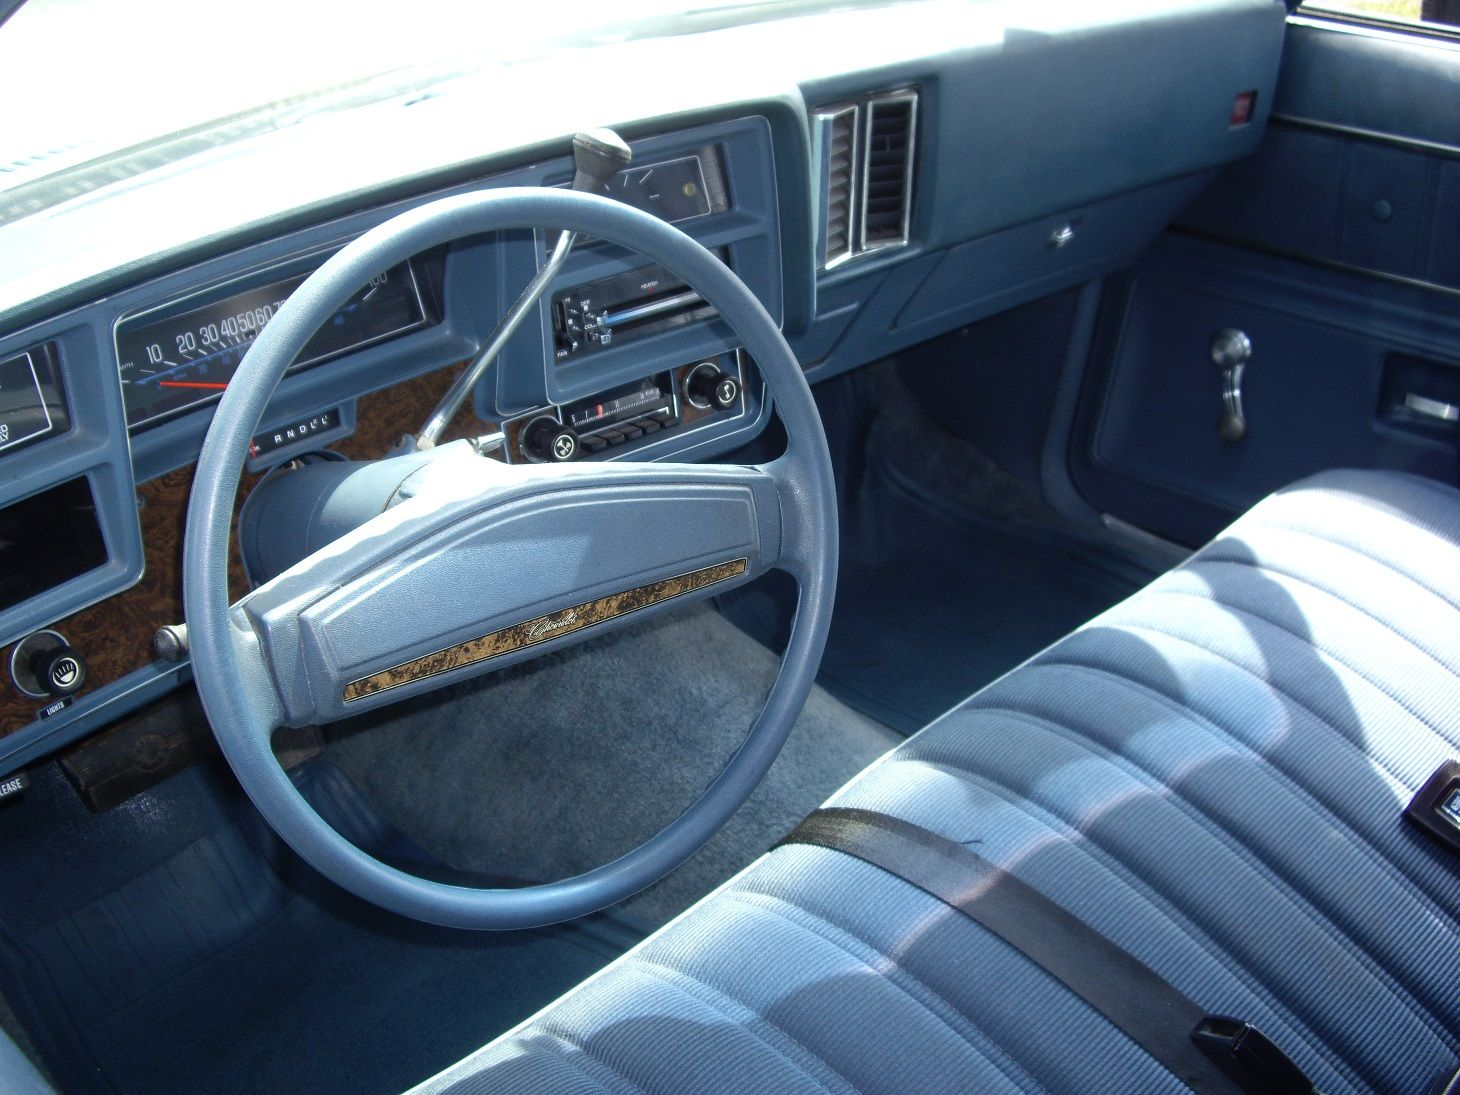 Malibu chevy classic malibu : 1975 Chevrolet Malibu Classic interior | Classic Car Interiors ...